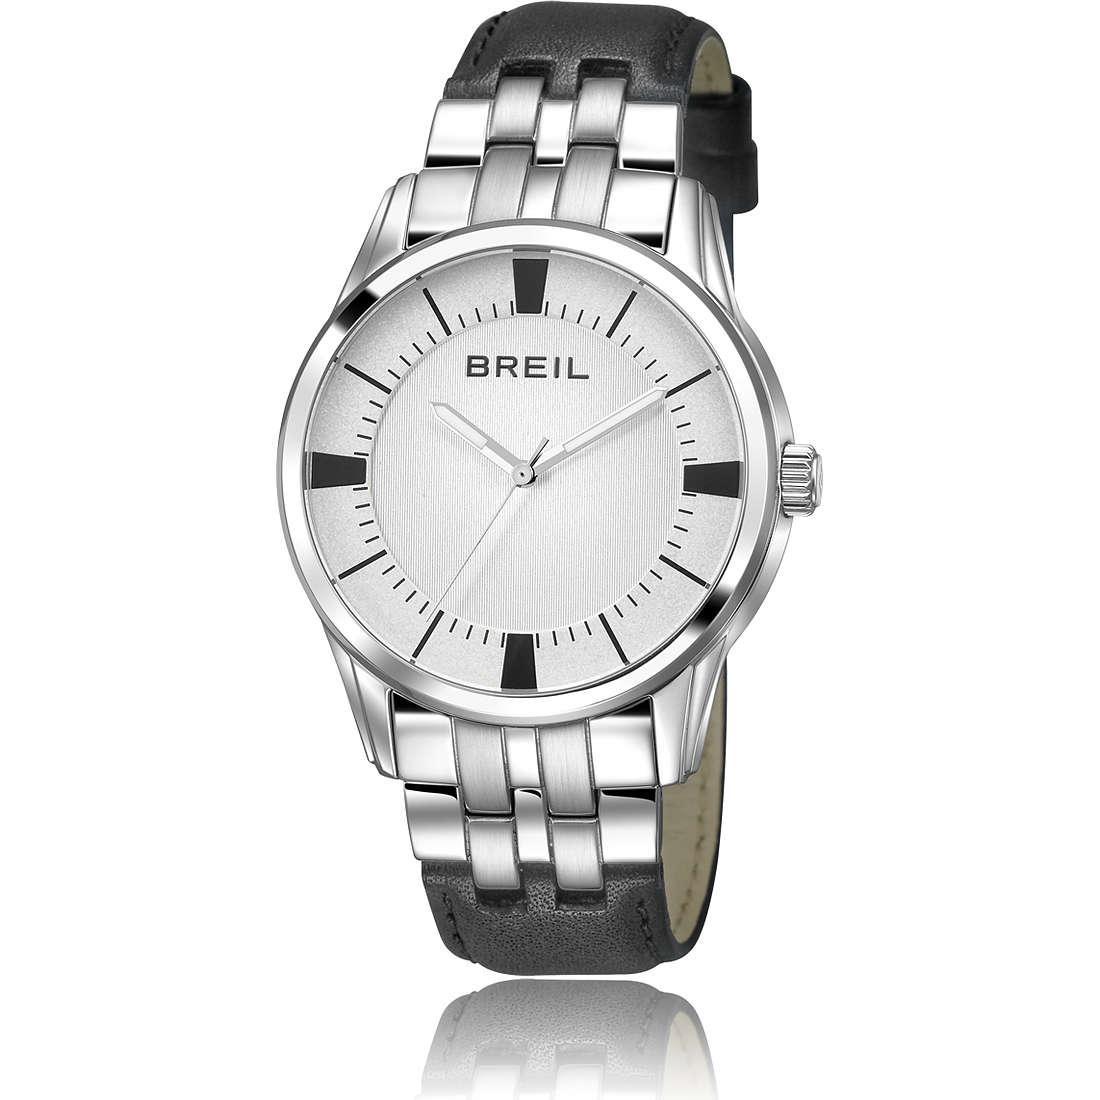 OROLOGIO BREIL B COOL TW1060